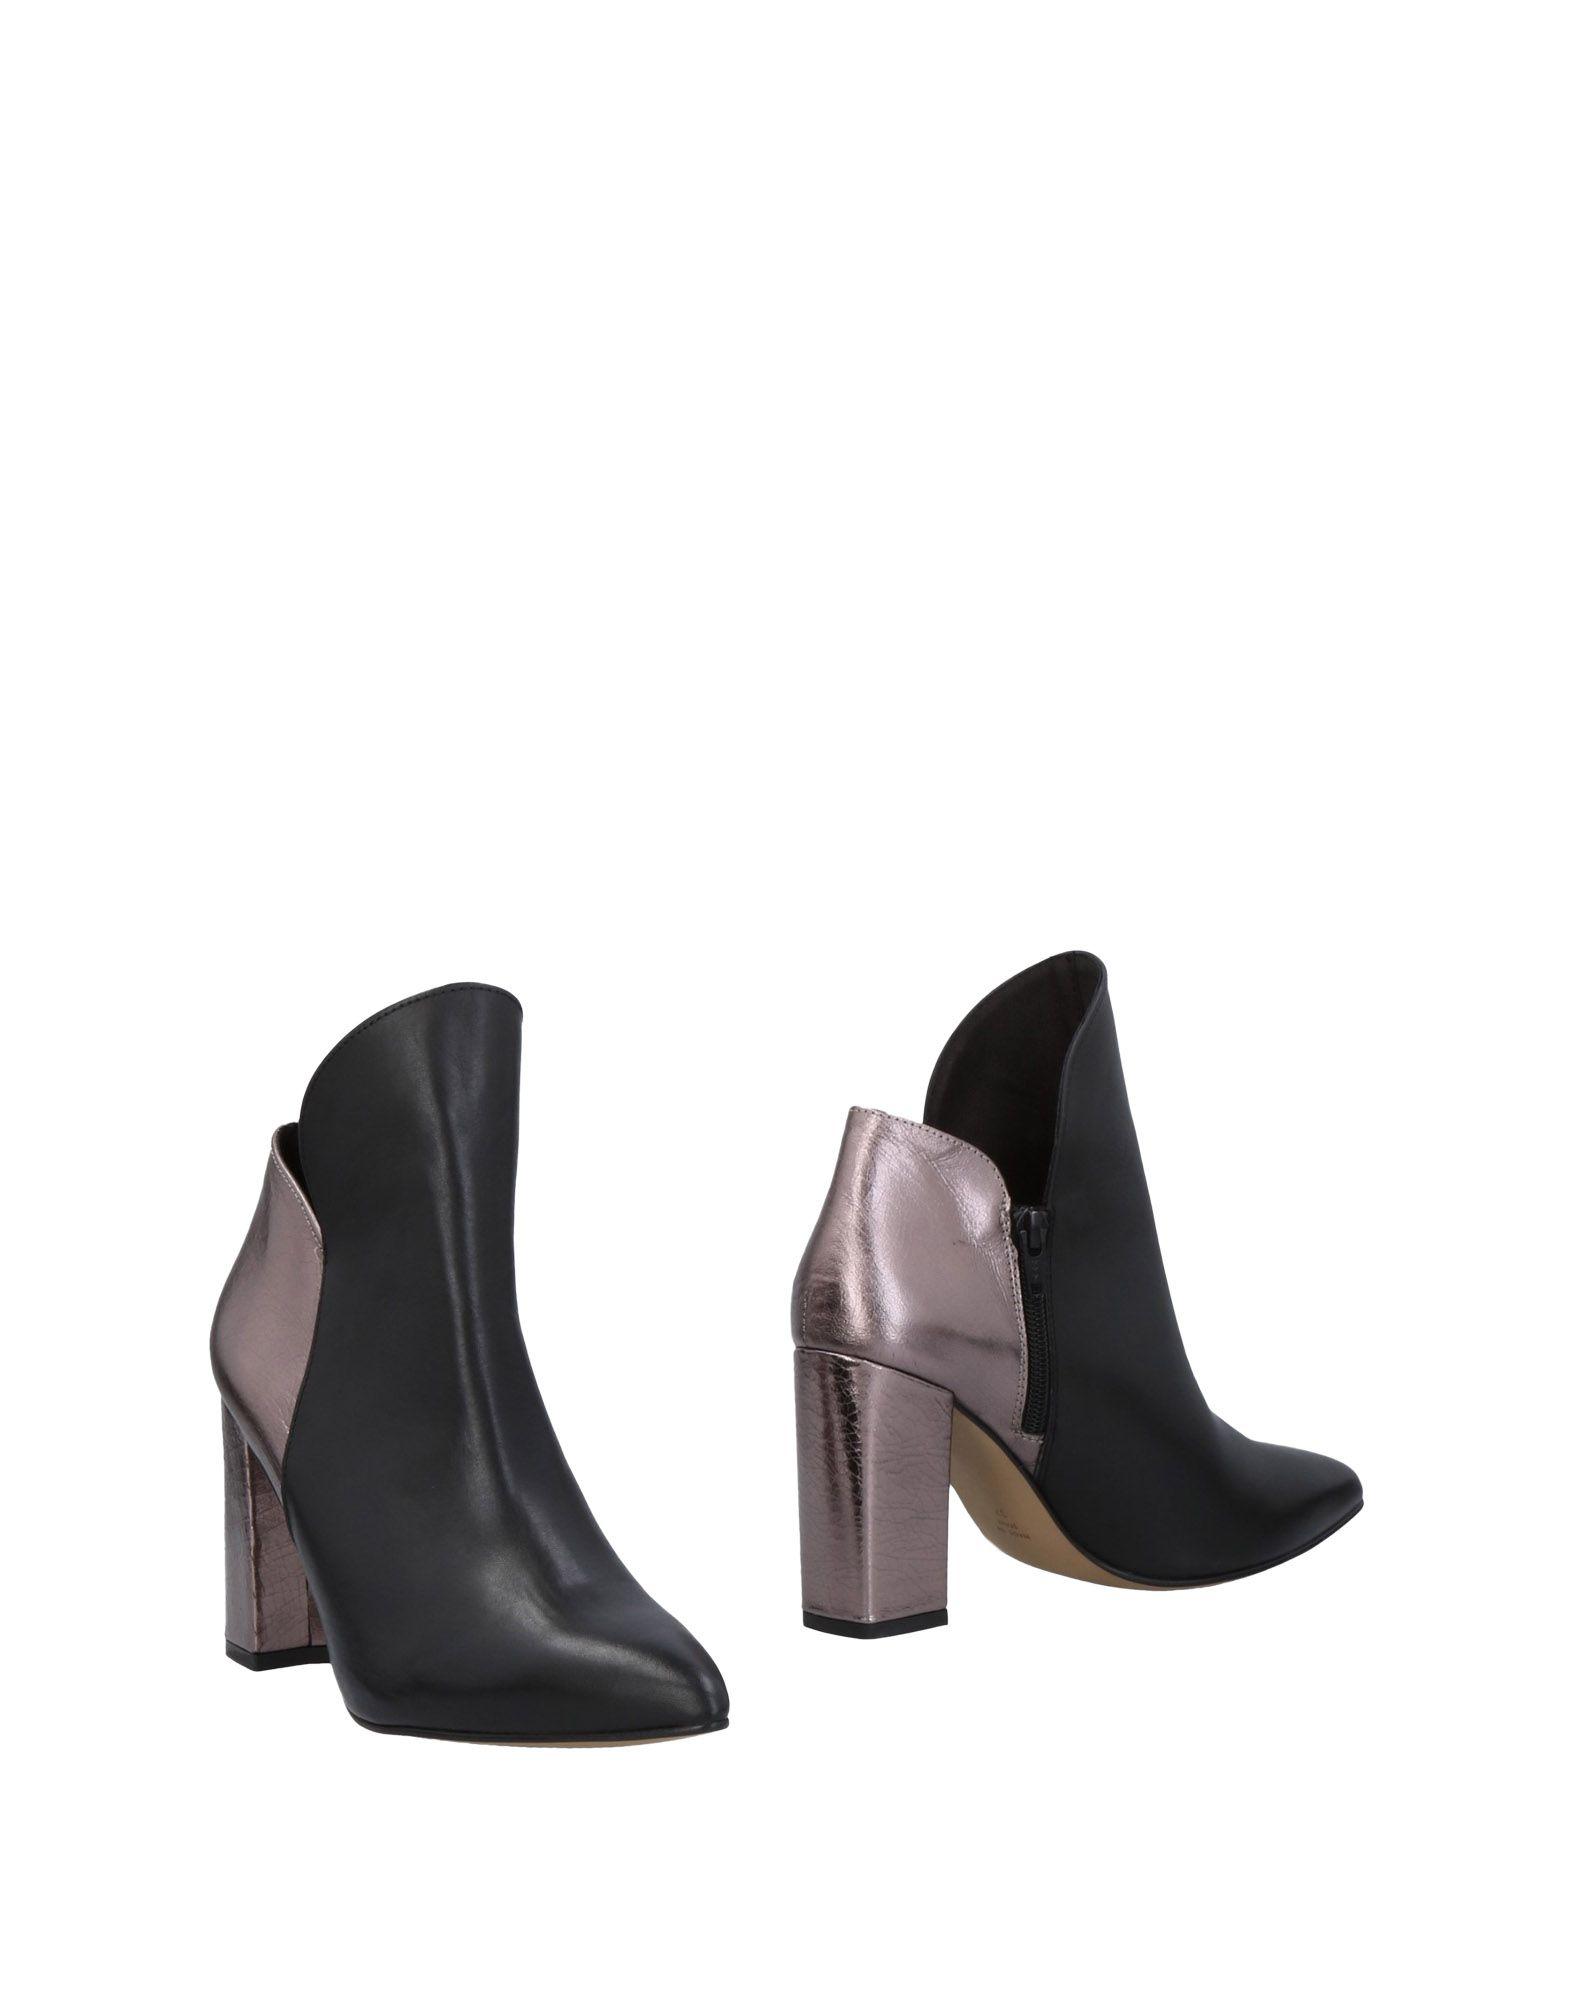 Stiù Stiefelette Damen beliebte  11461308OI Gute Qualität beliebte Damen Schuhe ac9d61